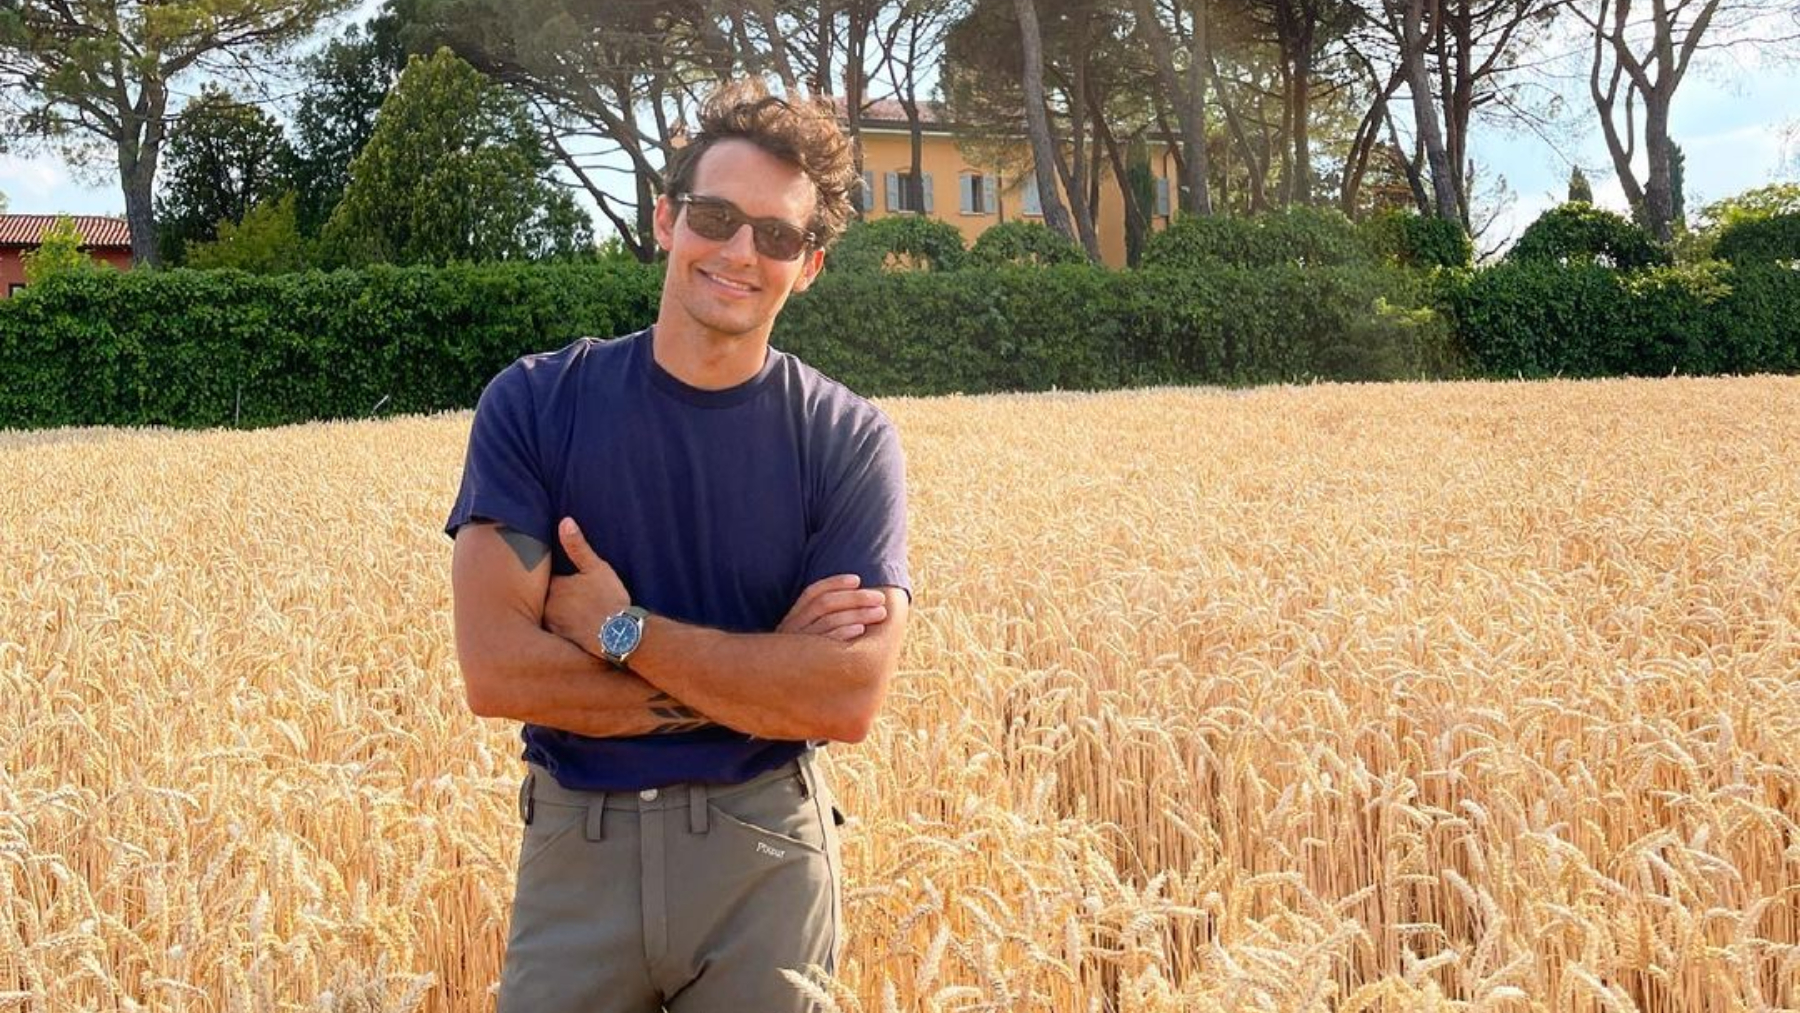 Riccardo Pozzoli con camiseta / Foto: @riccardopozzoli